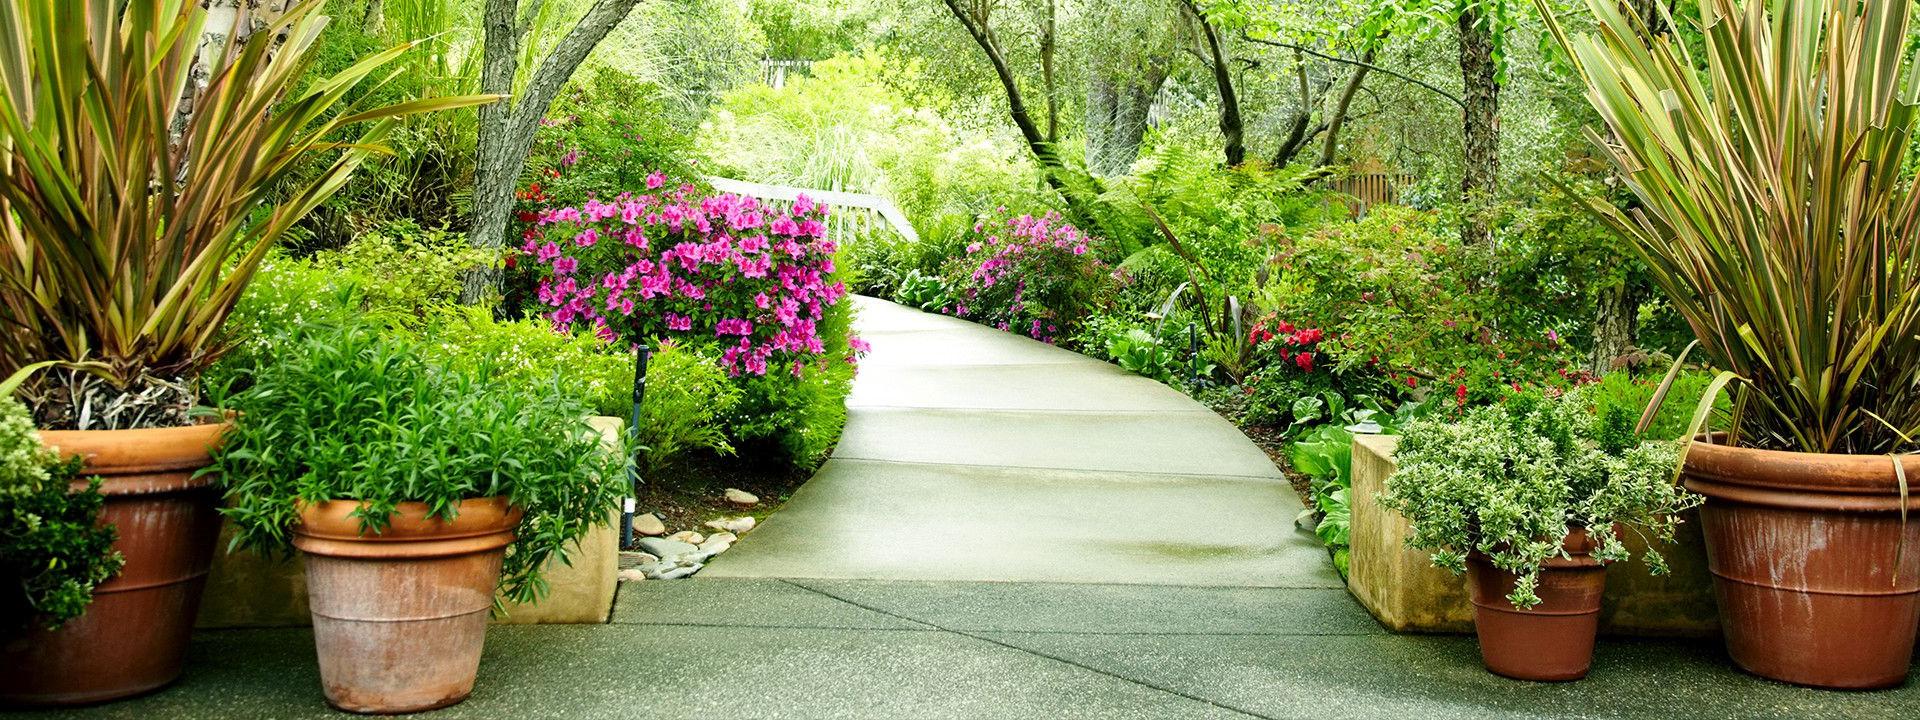 Resources | Gethsemane Cemetery and Memorial Gardens